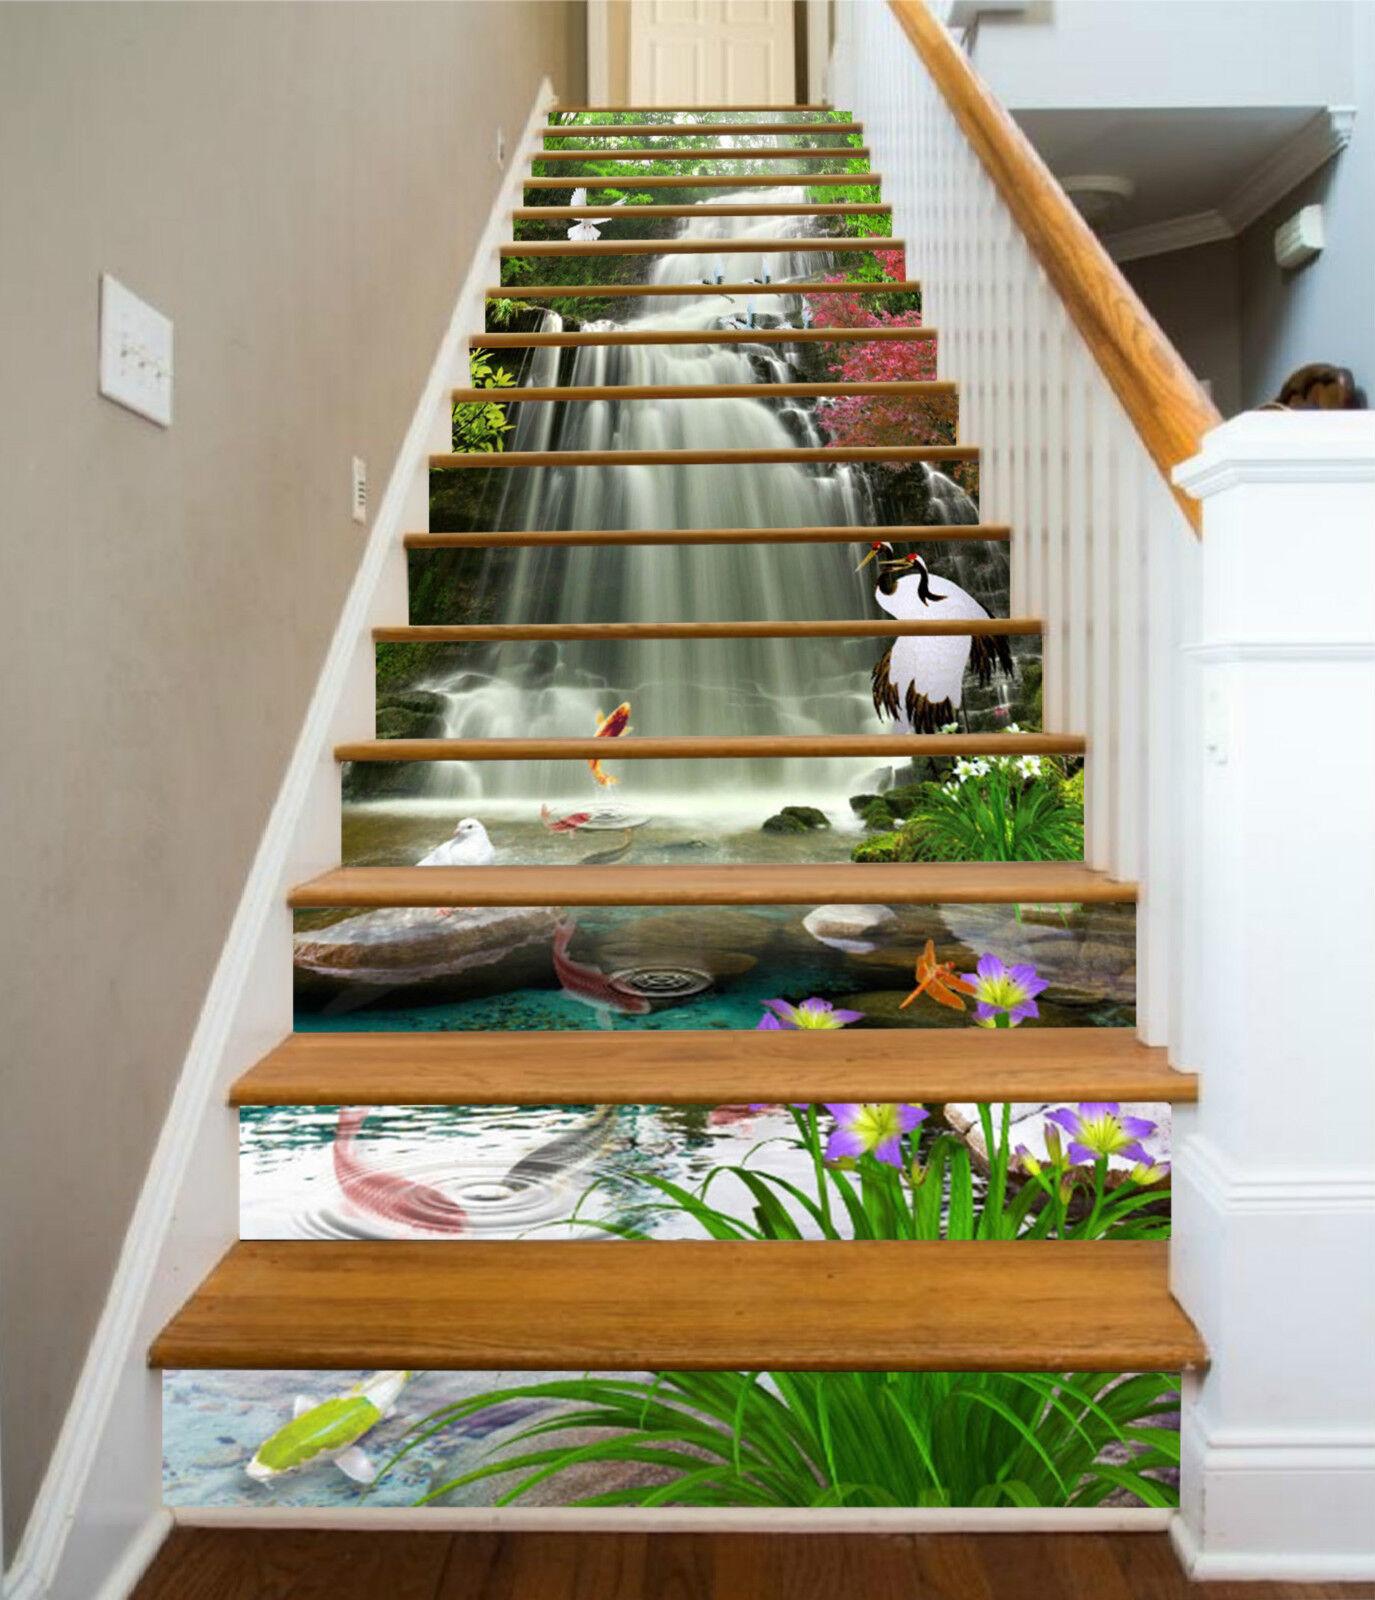 3D Fällt Tieres 211 Stair Risers Dekoration Fototapete Vinyl Aufkleber Tapete DE